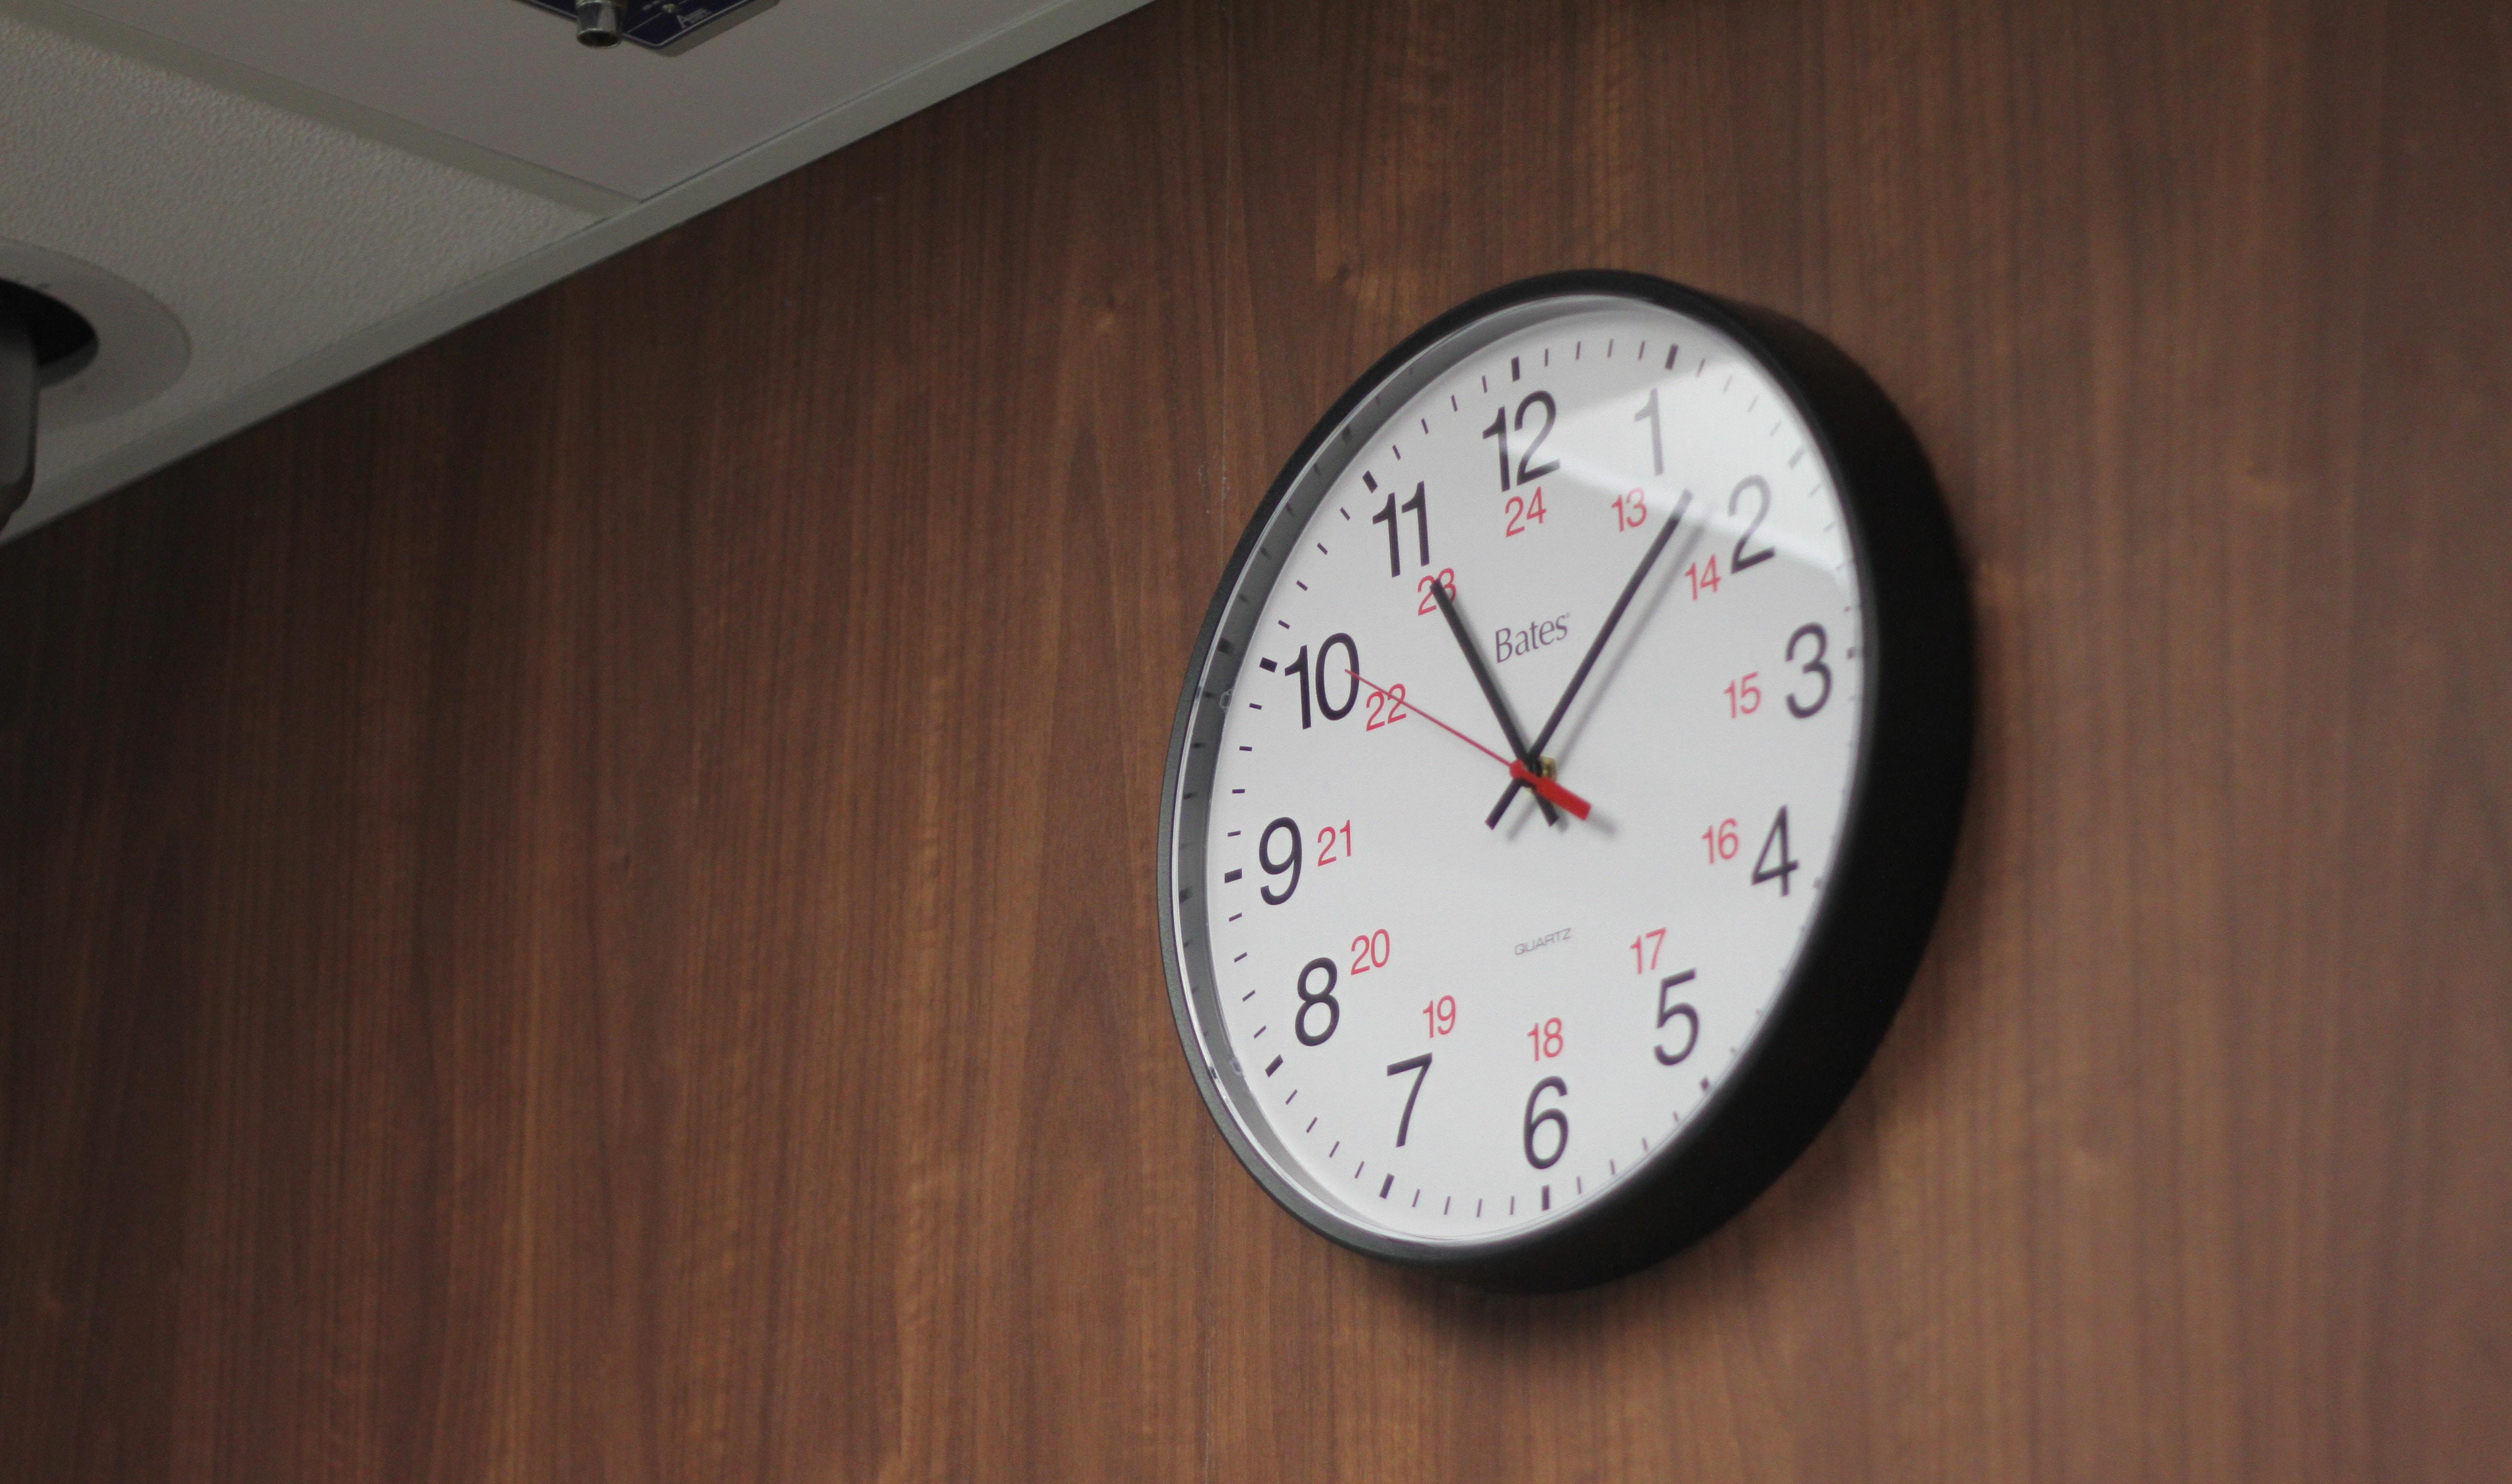 round black and white analog wall clock at 1:55